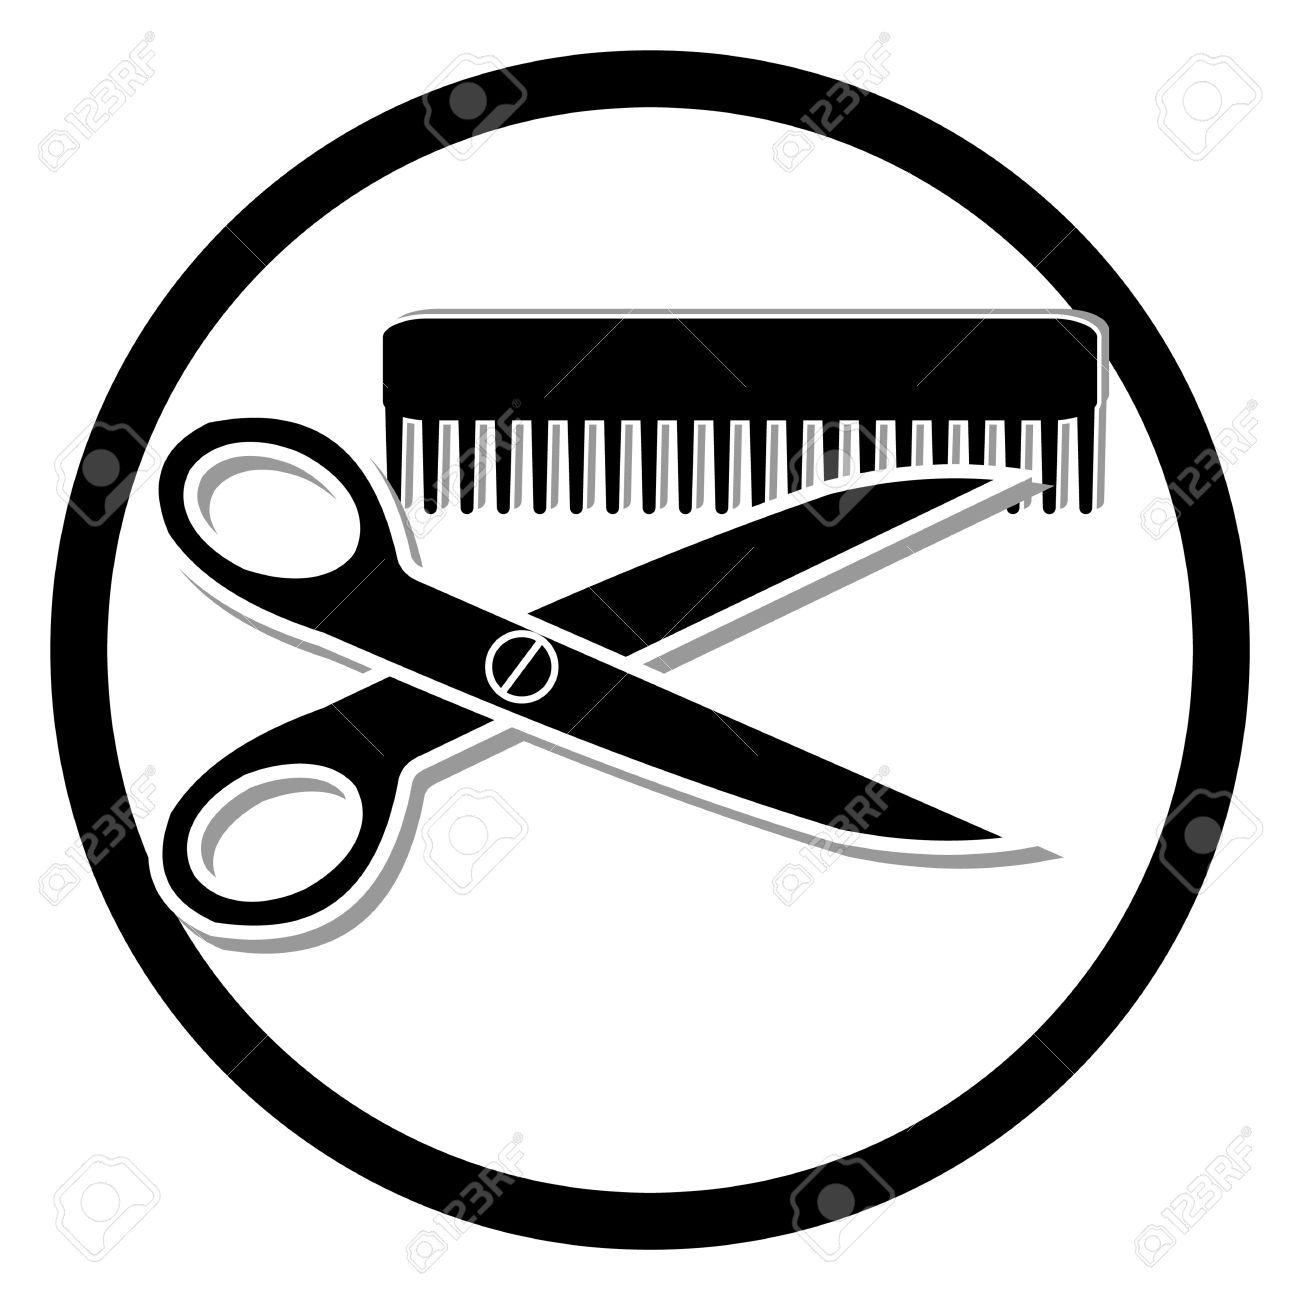 Free haircut clipart banner transparent download Hair Cut Clipart | Free download best Hair Cut Clipart on ClipArtMag.com banner transparent download